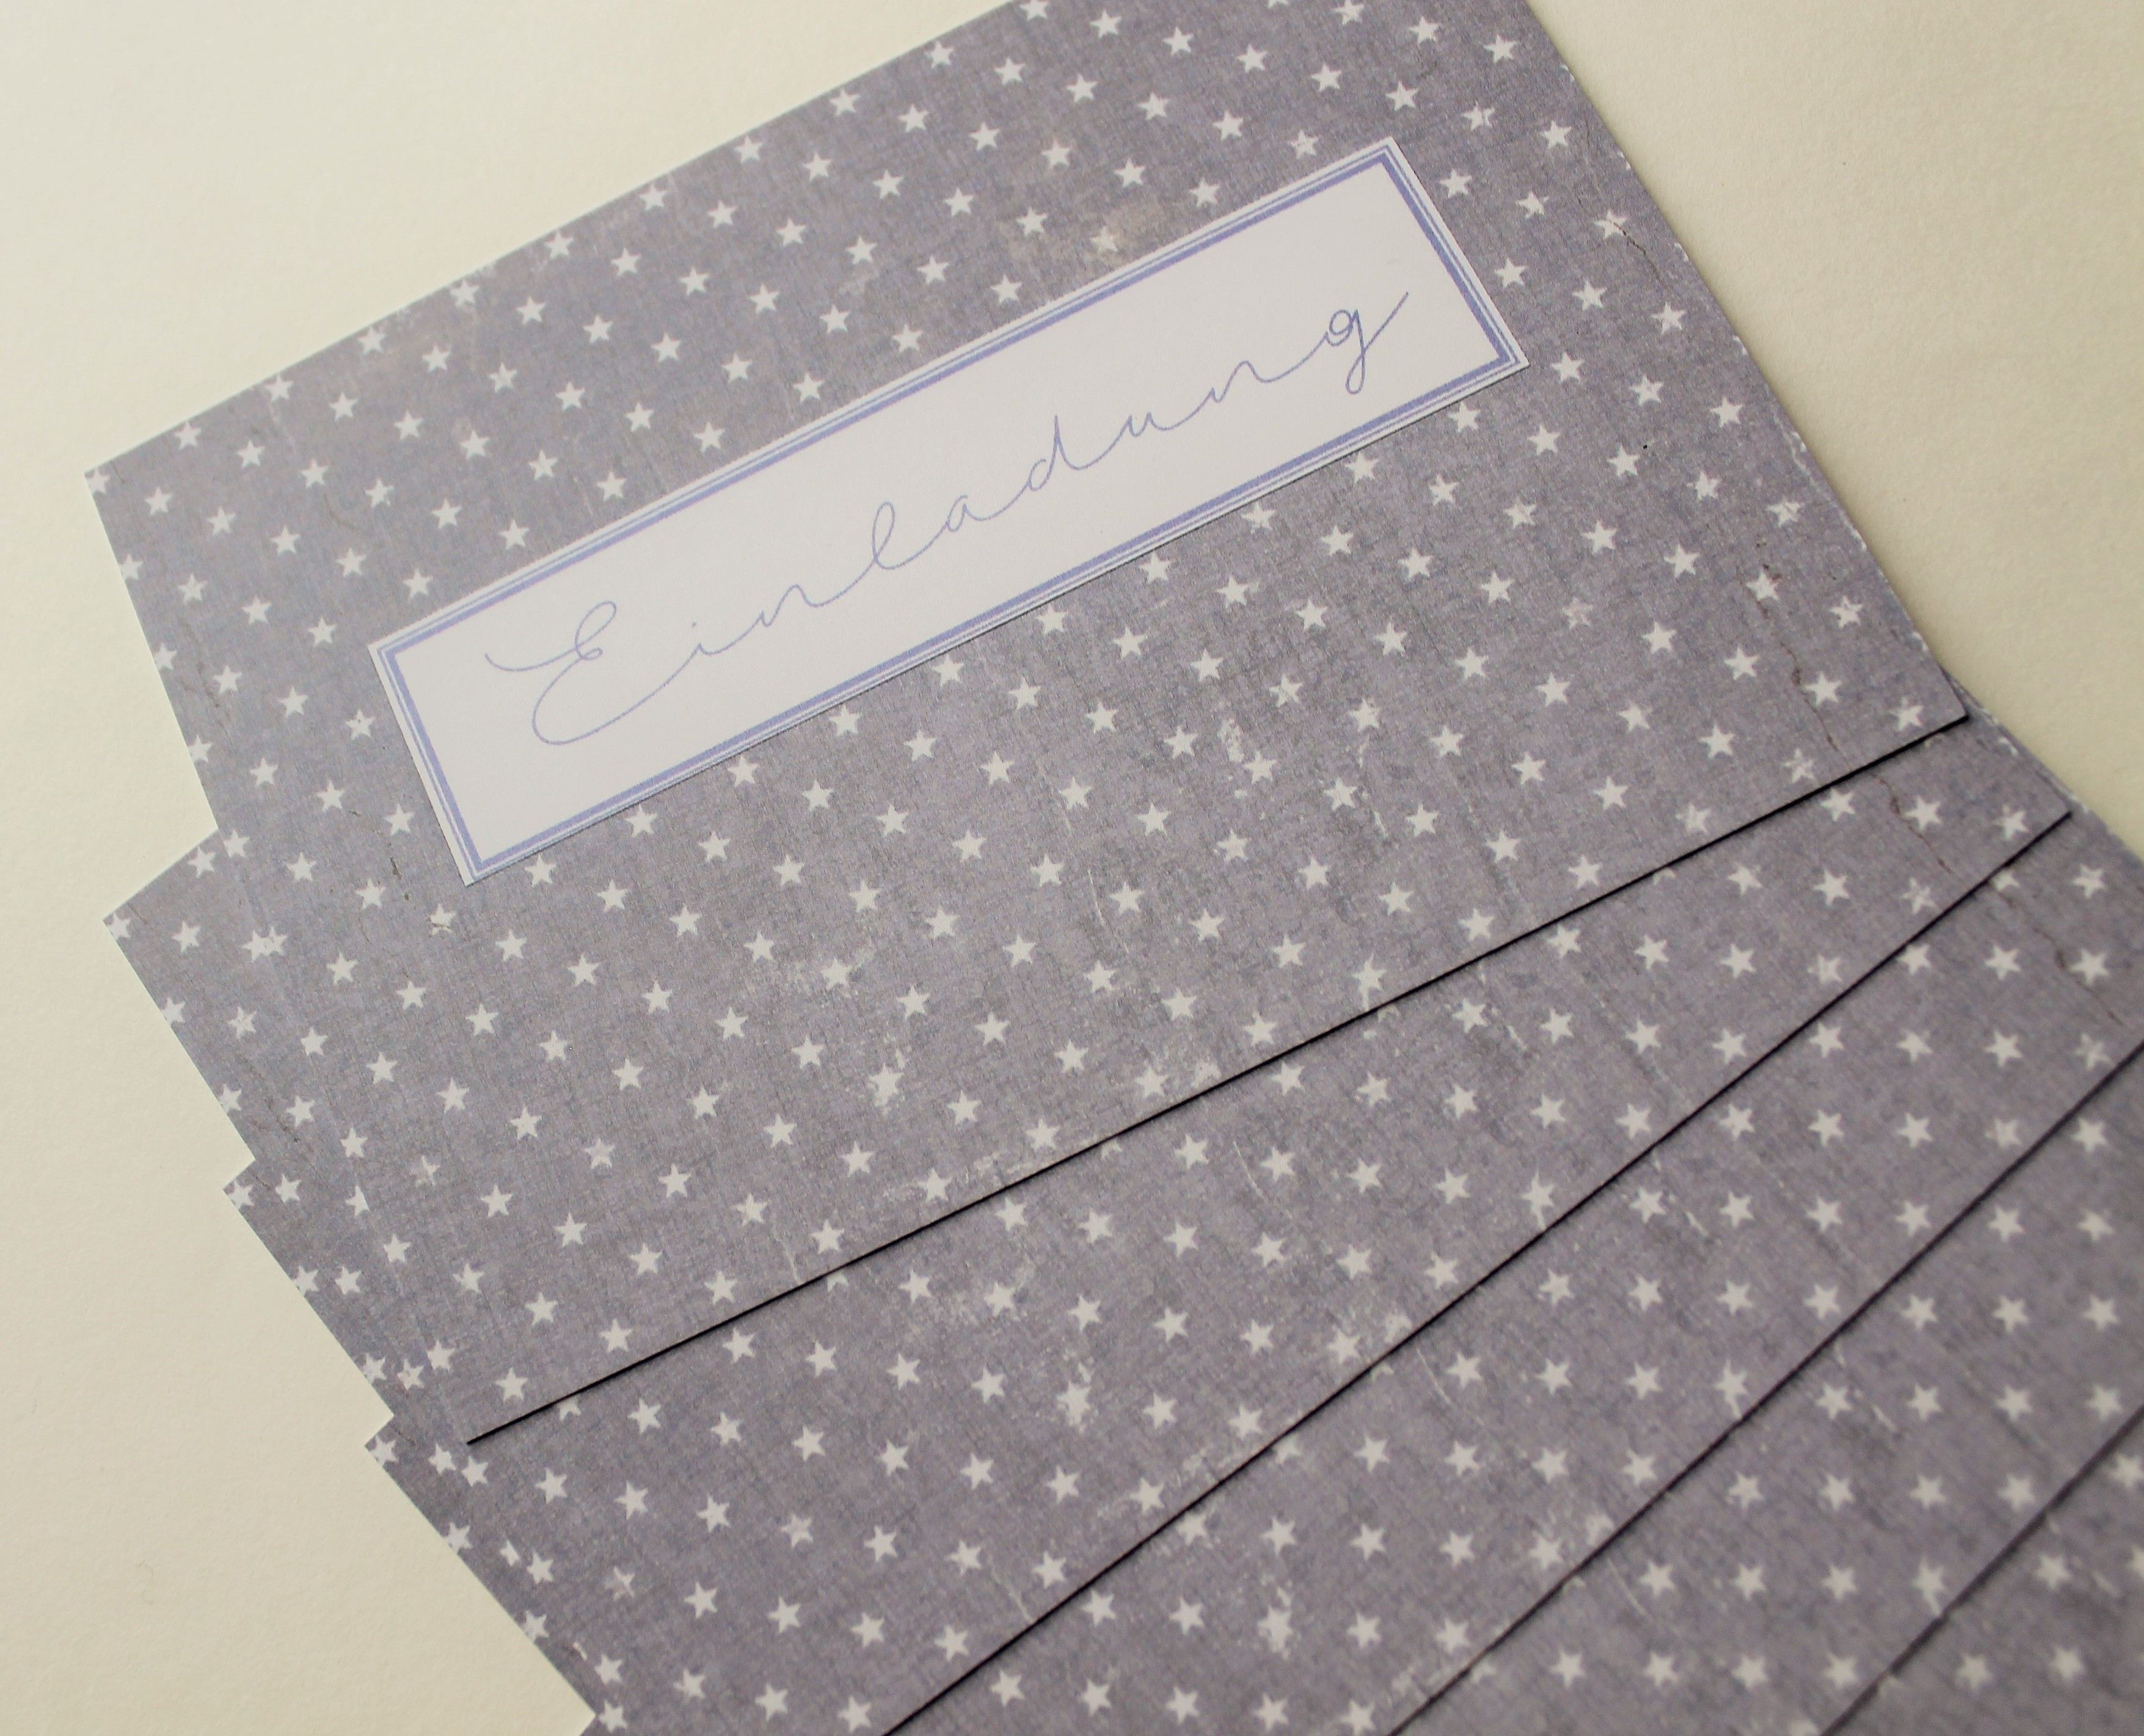 Einladungskarten Kindergeburtstag, Geburtstagseinladung, Kinder , Sterne,  Papiergarten Doreen Froede